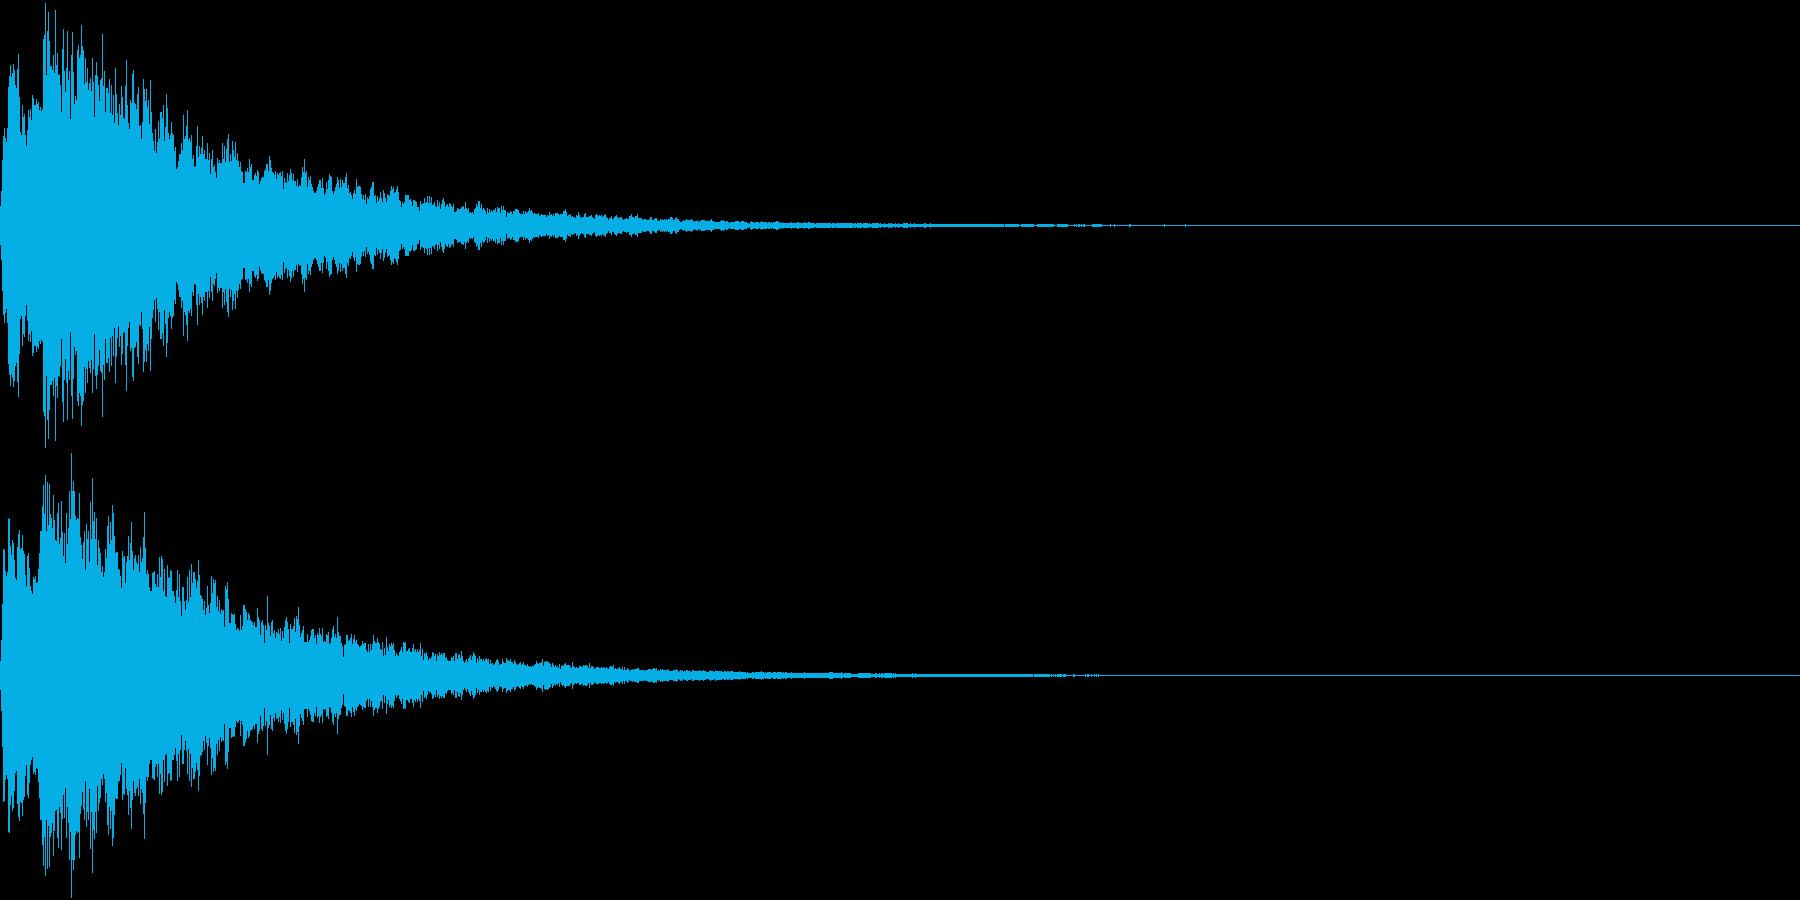 PAY 電子マネー支払い音 1の再生済みの波形